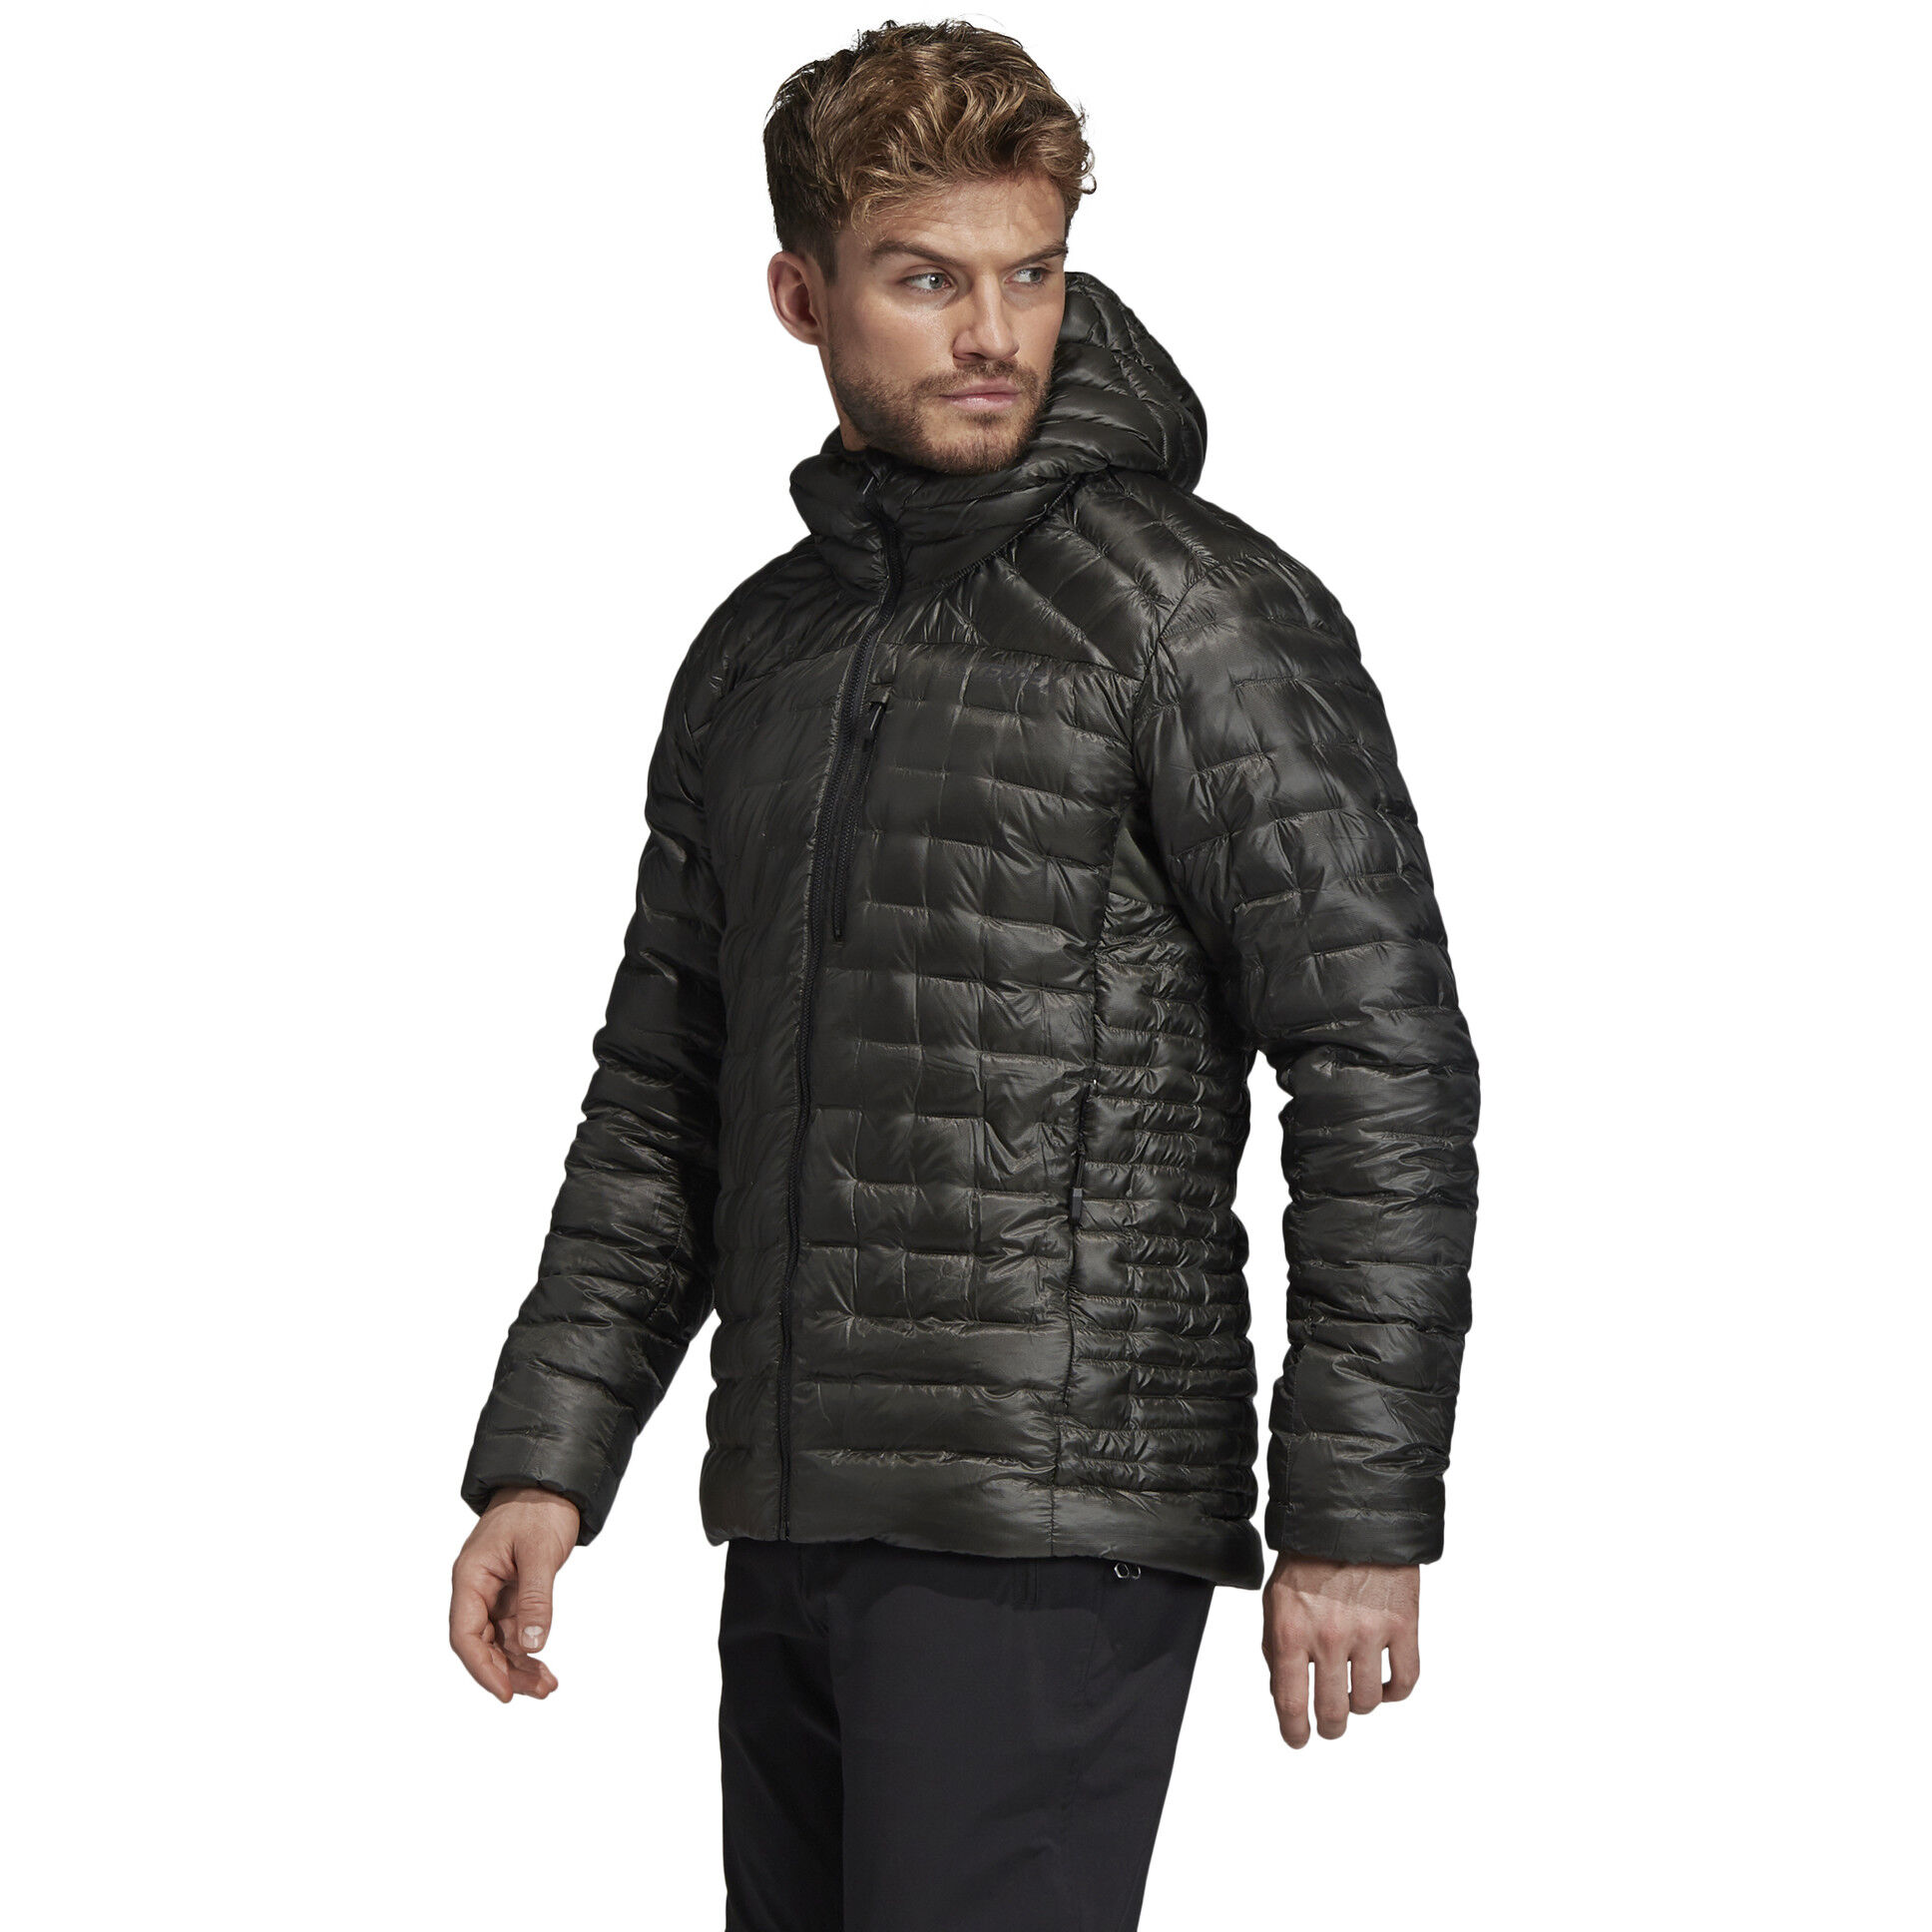 Climaheat Herren legear adidas Jacke TERREX uFJ3cTKl1